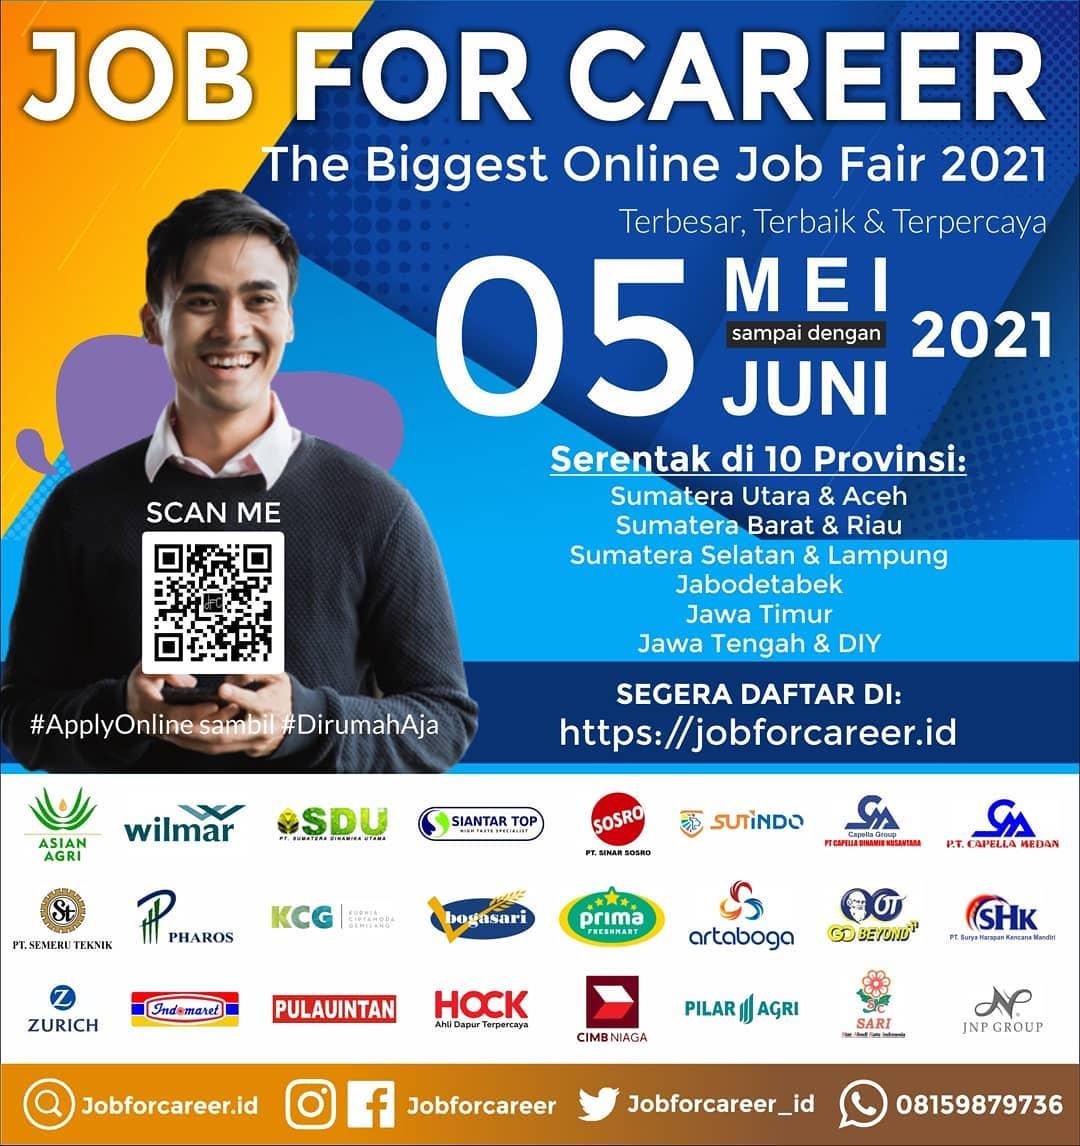 JOB FOR CAREER - The Biggest Online Job Fair 2021